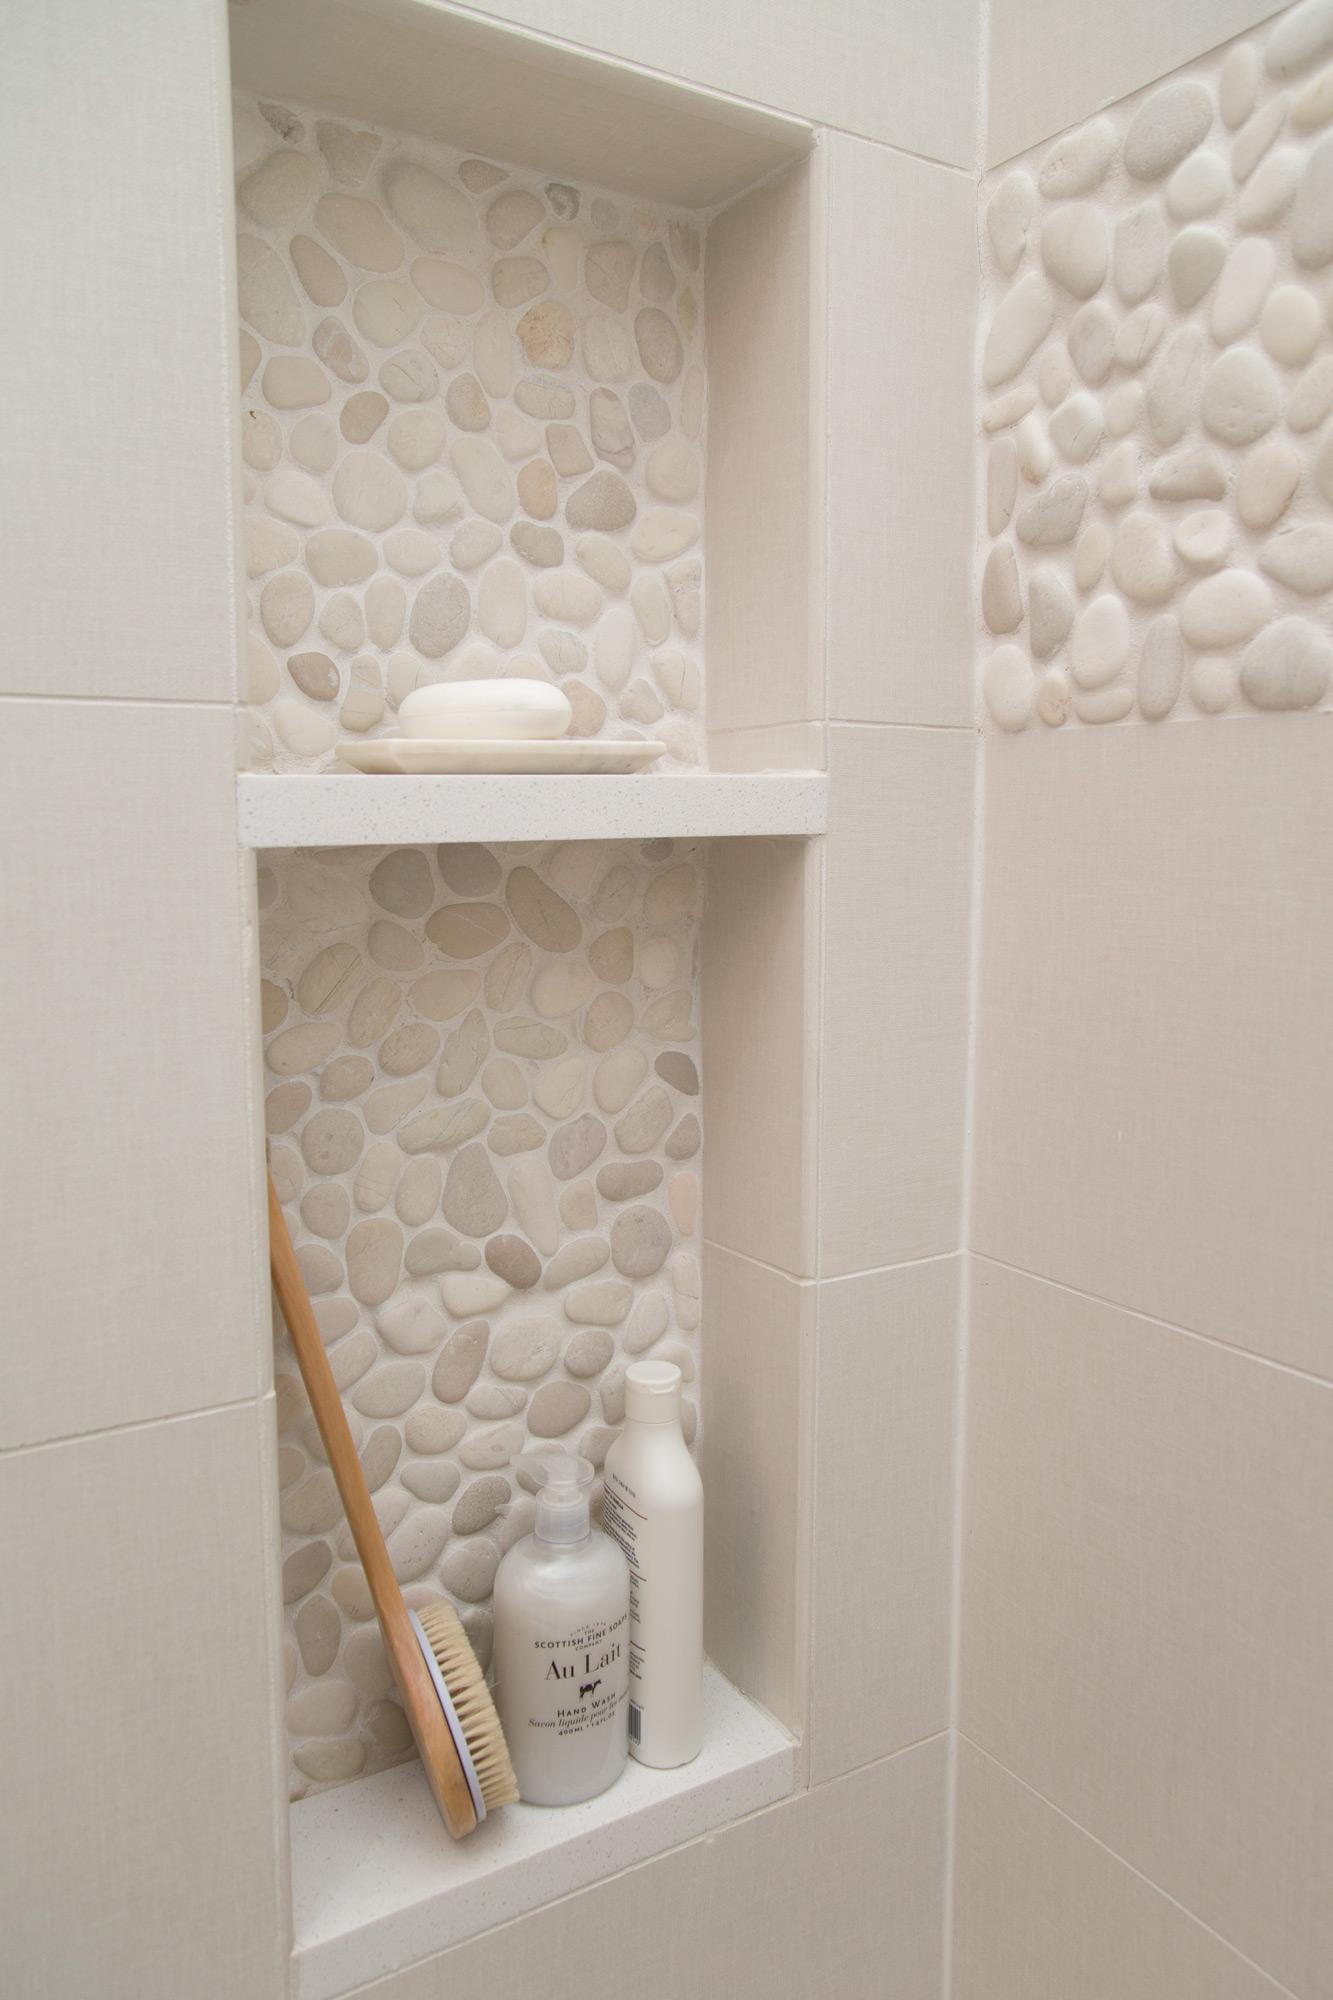 Master bathroom remodel with shower shampoo niche in pebble tile | Interior Designer: Carla Aston / Photographer: Tori Aston #bathroomideas #bathroomremodel #shampooniche #bathroomshower